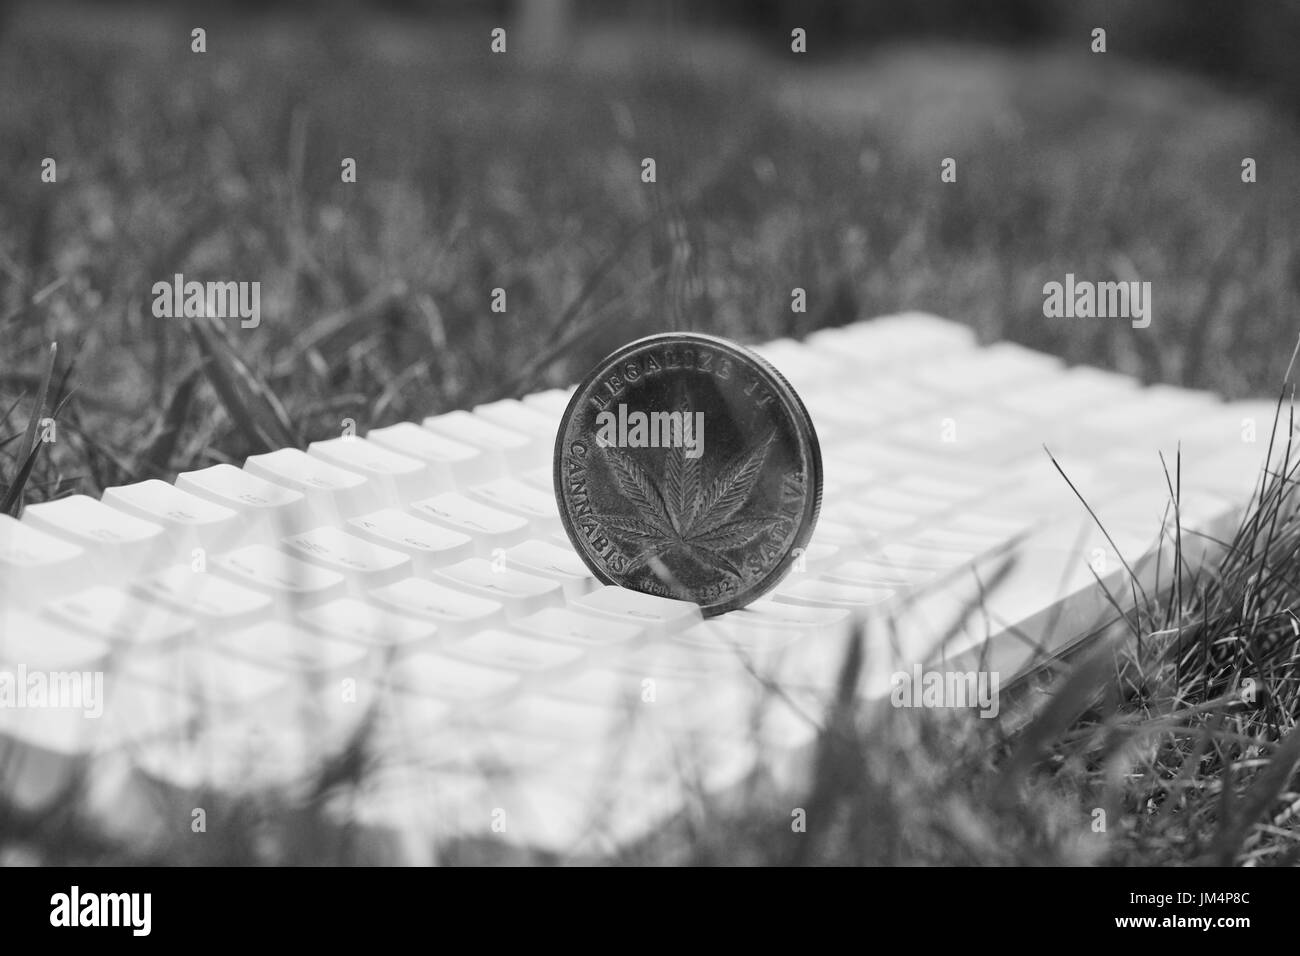 Marijuana black and white stock photos images alamy marijuana cannabis sativa coin on the white keyboard black and white scene stock biocorpaavc Images